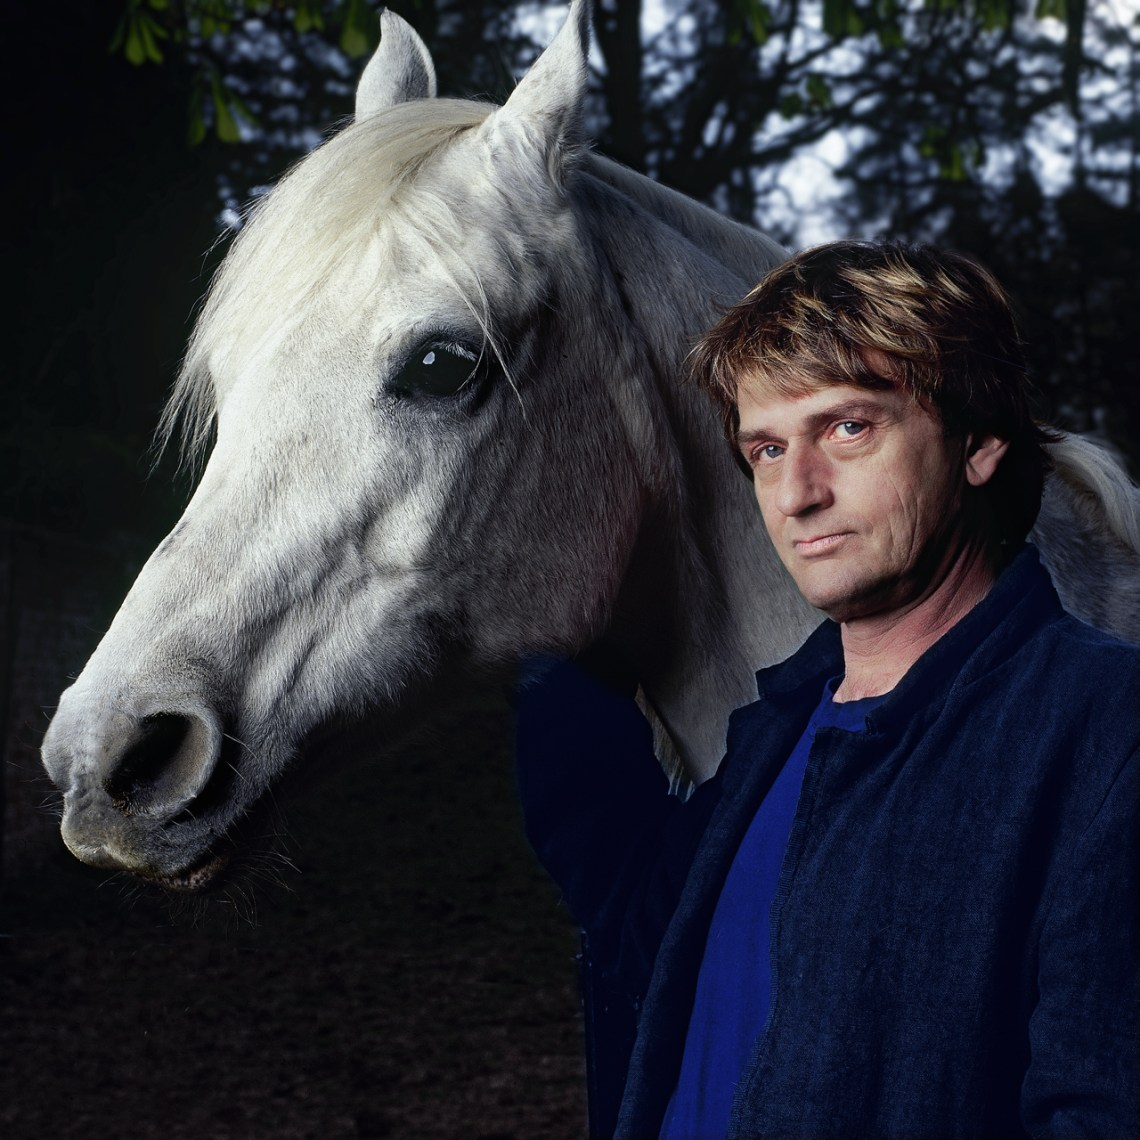 Mike-Oldfield-horse-2.Arrowsmith